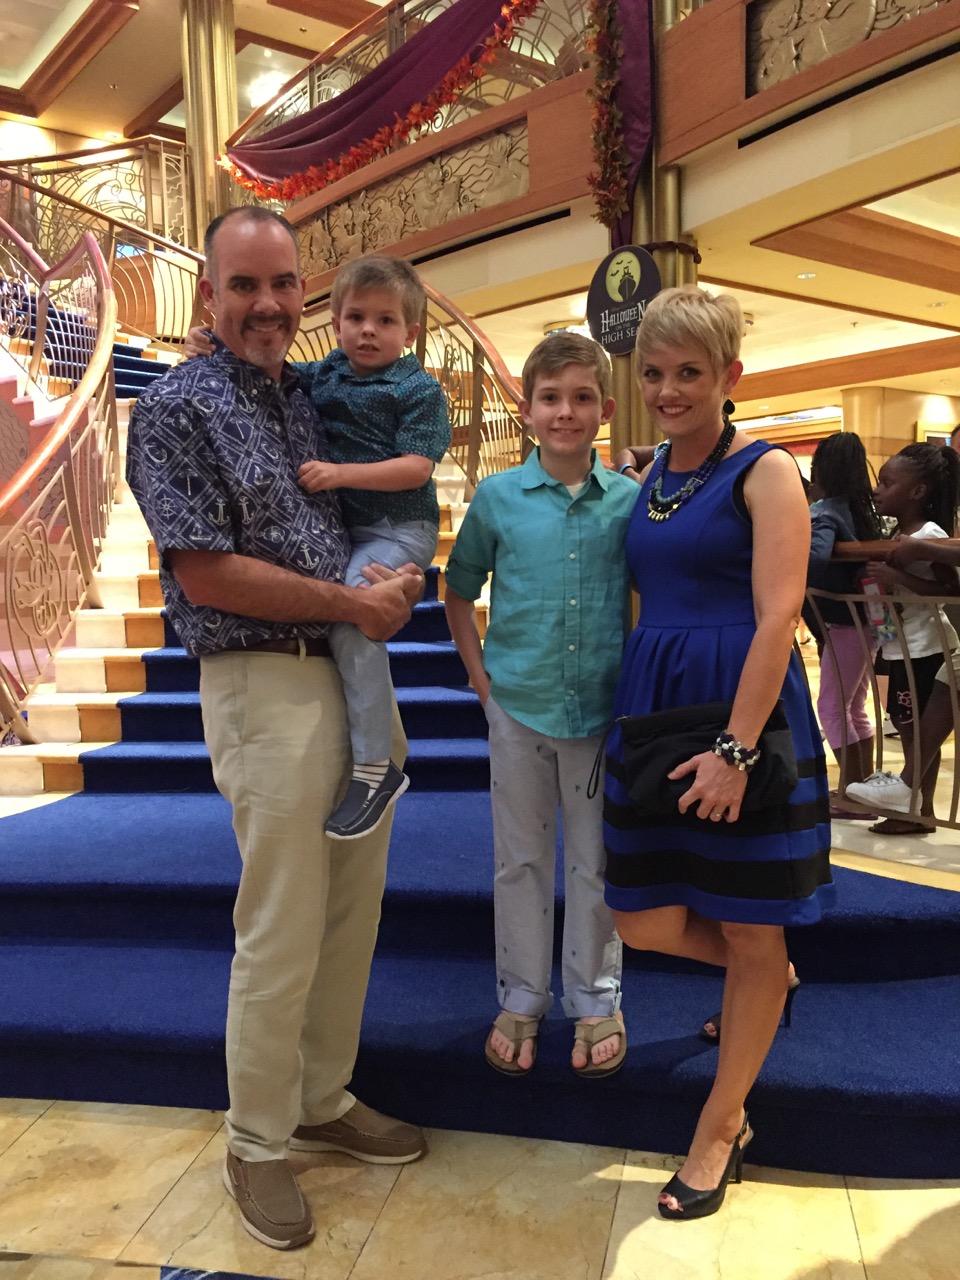 Disney Dream Atrium Stairway Family Photo